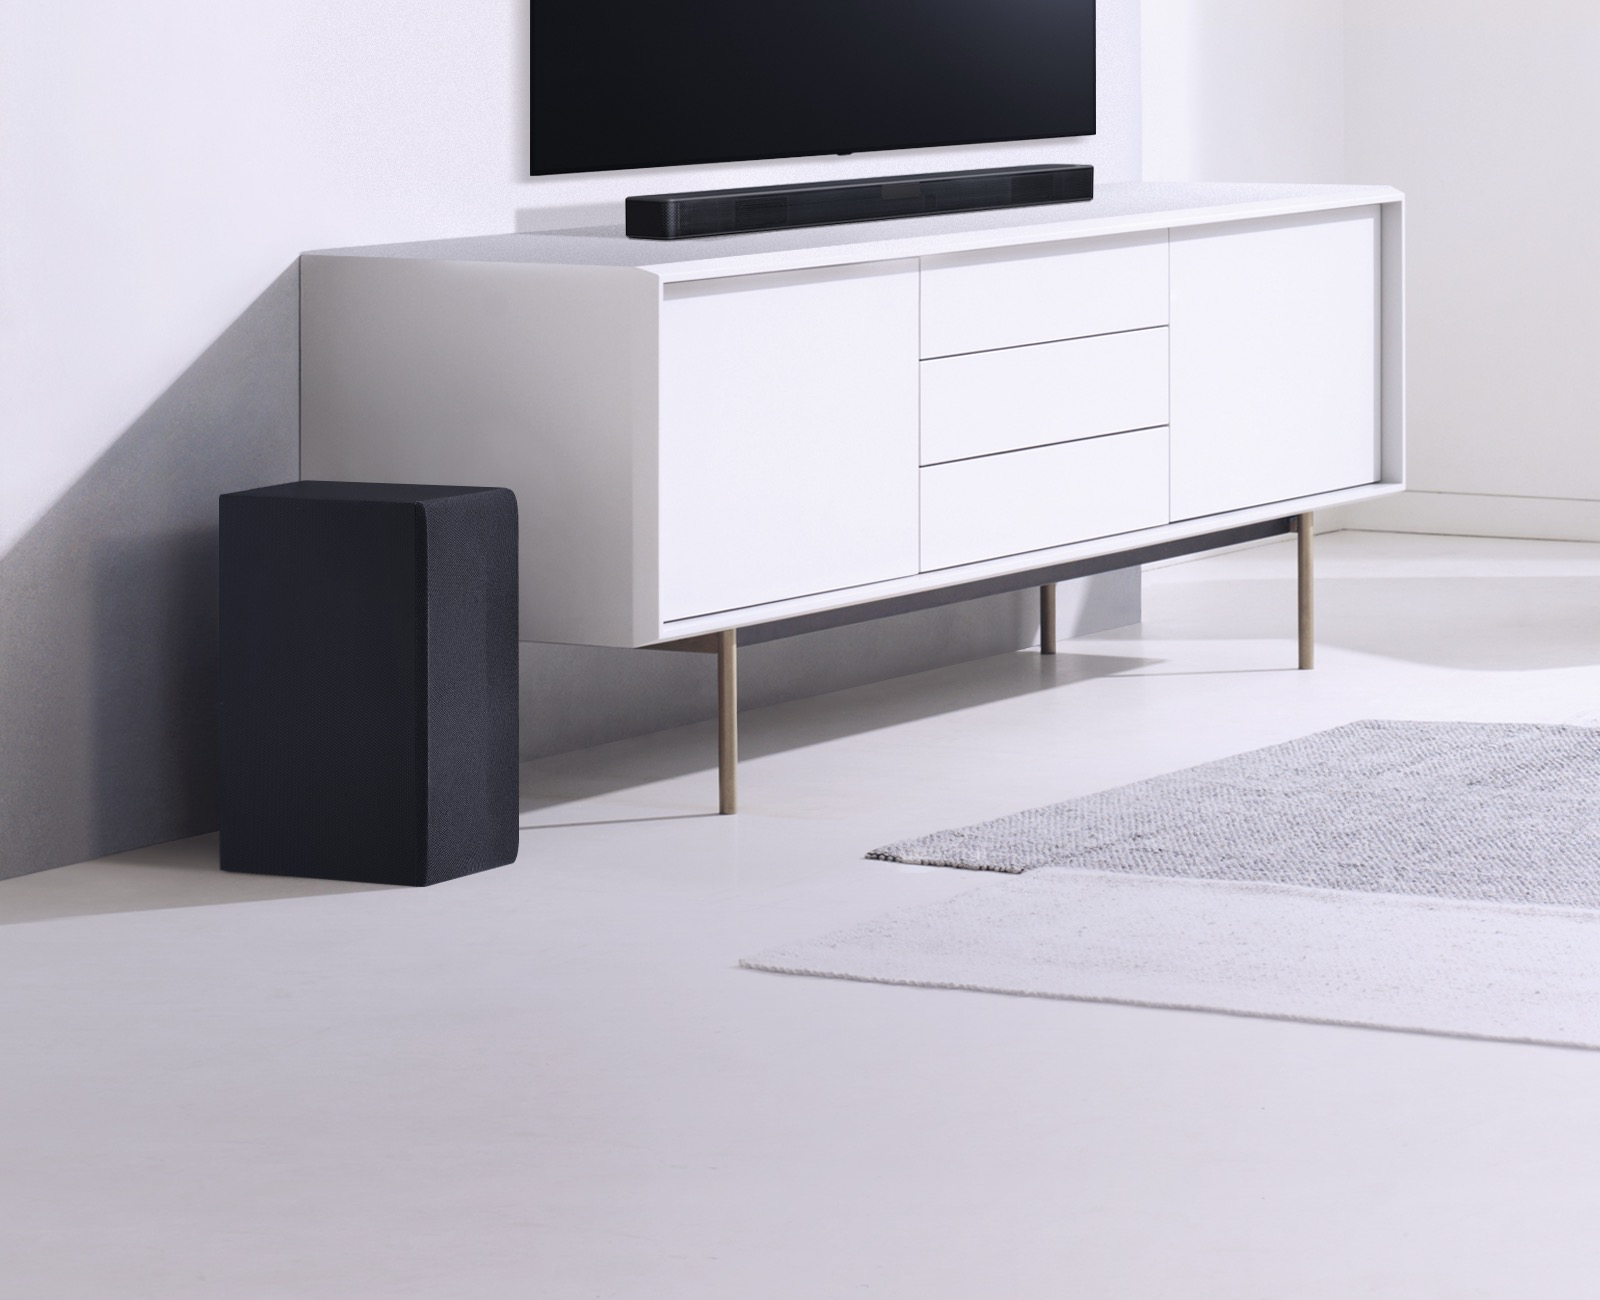 CAV-SoundBar-SL4-03-Wireless-Subwoofer-Desktop